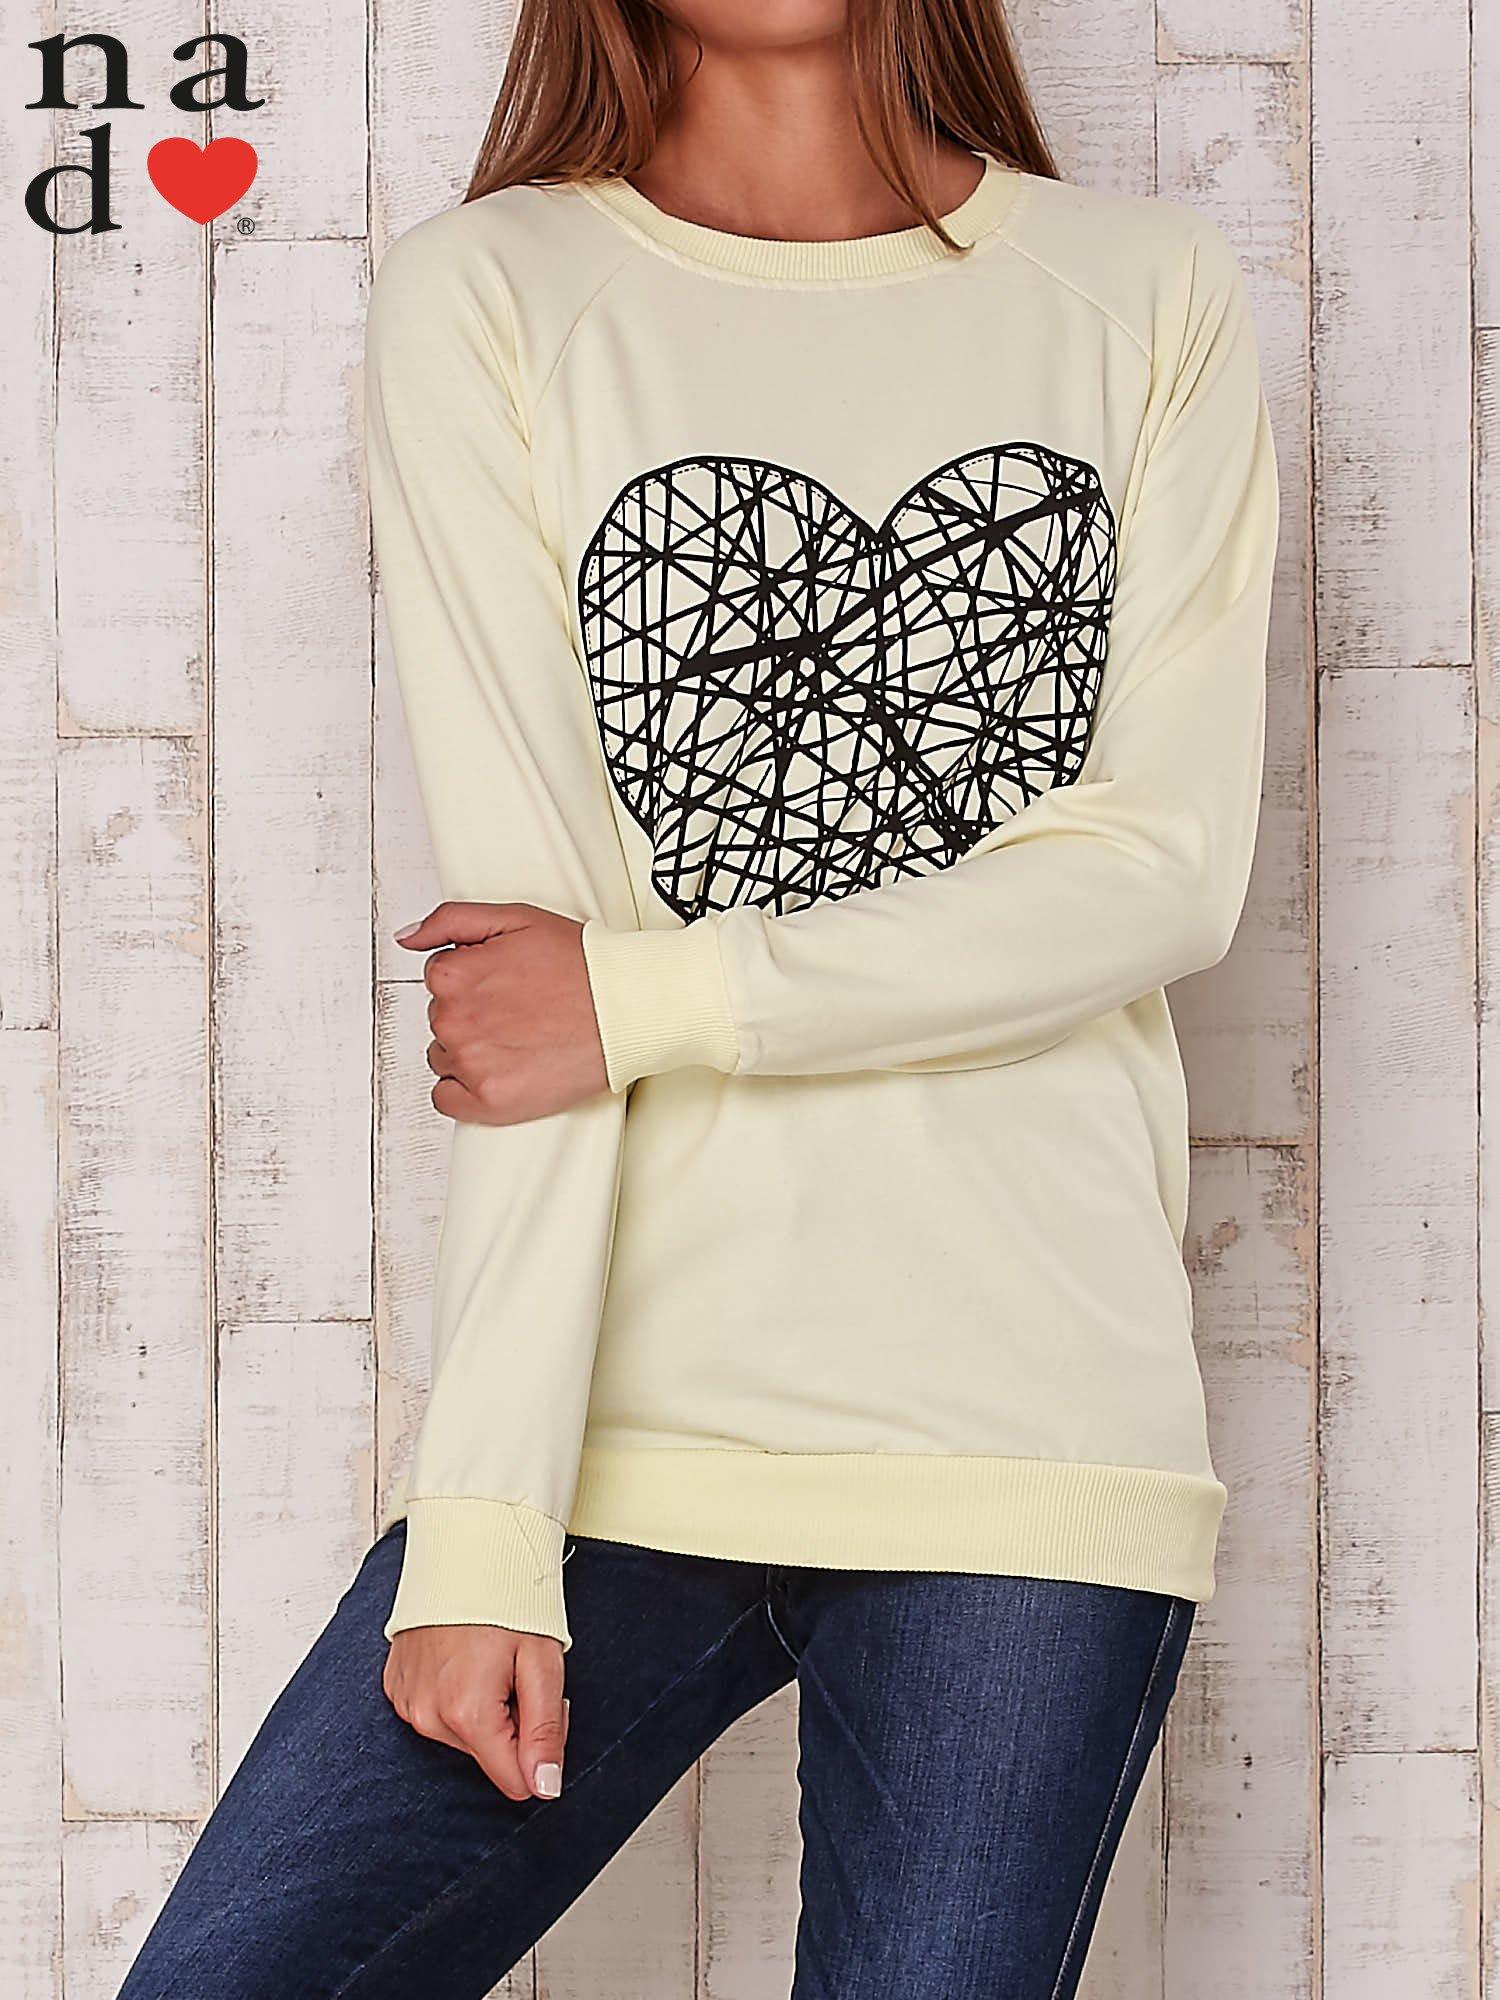 Żółta bluza z nadrukiem serca                                  zdj.                                  2